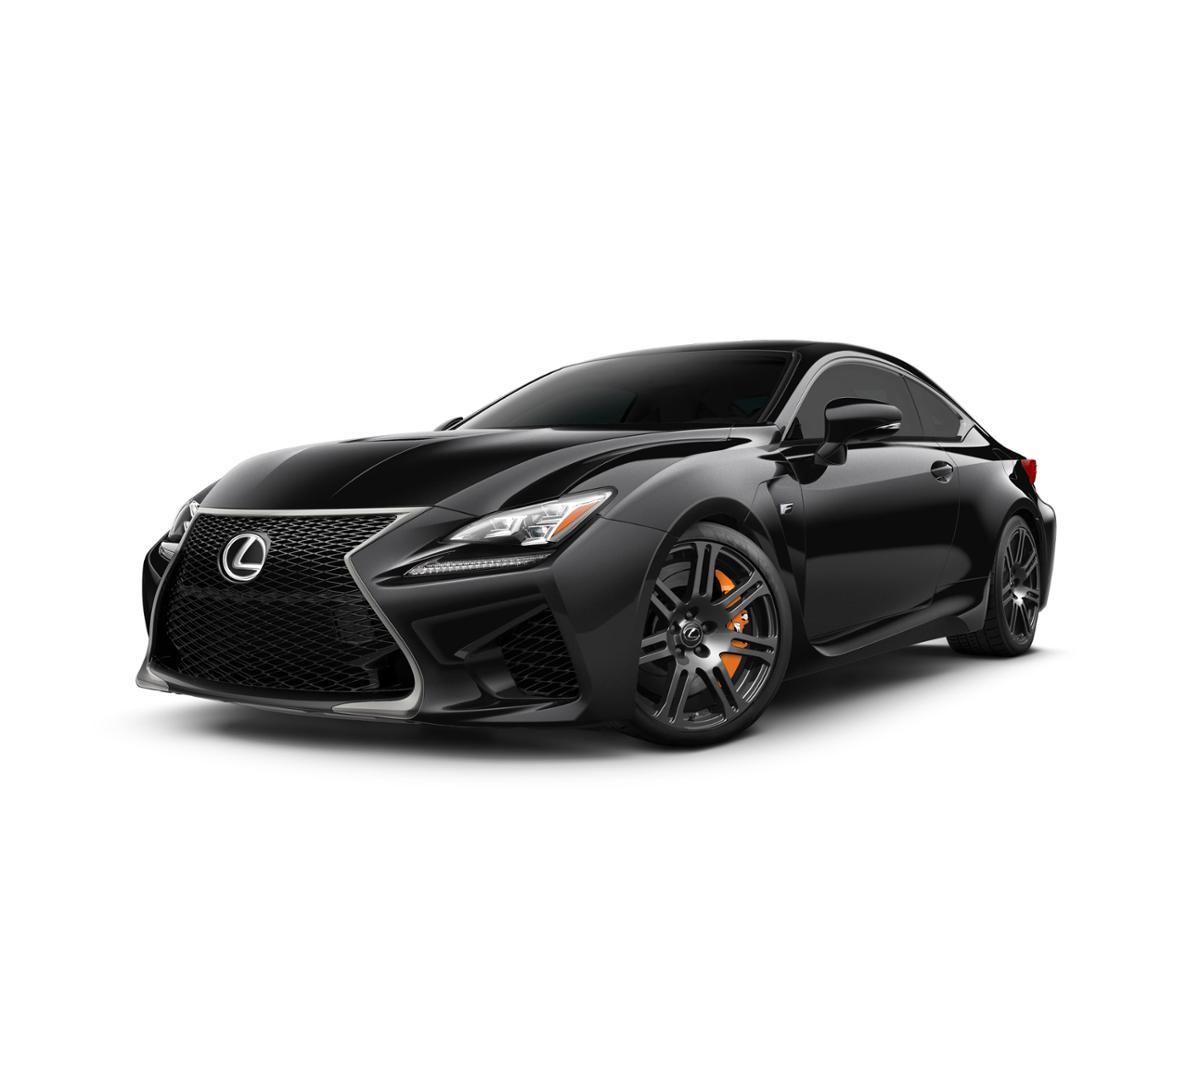 2017 Lexus RC F For Sale In San Jose